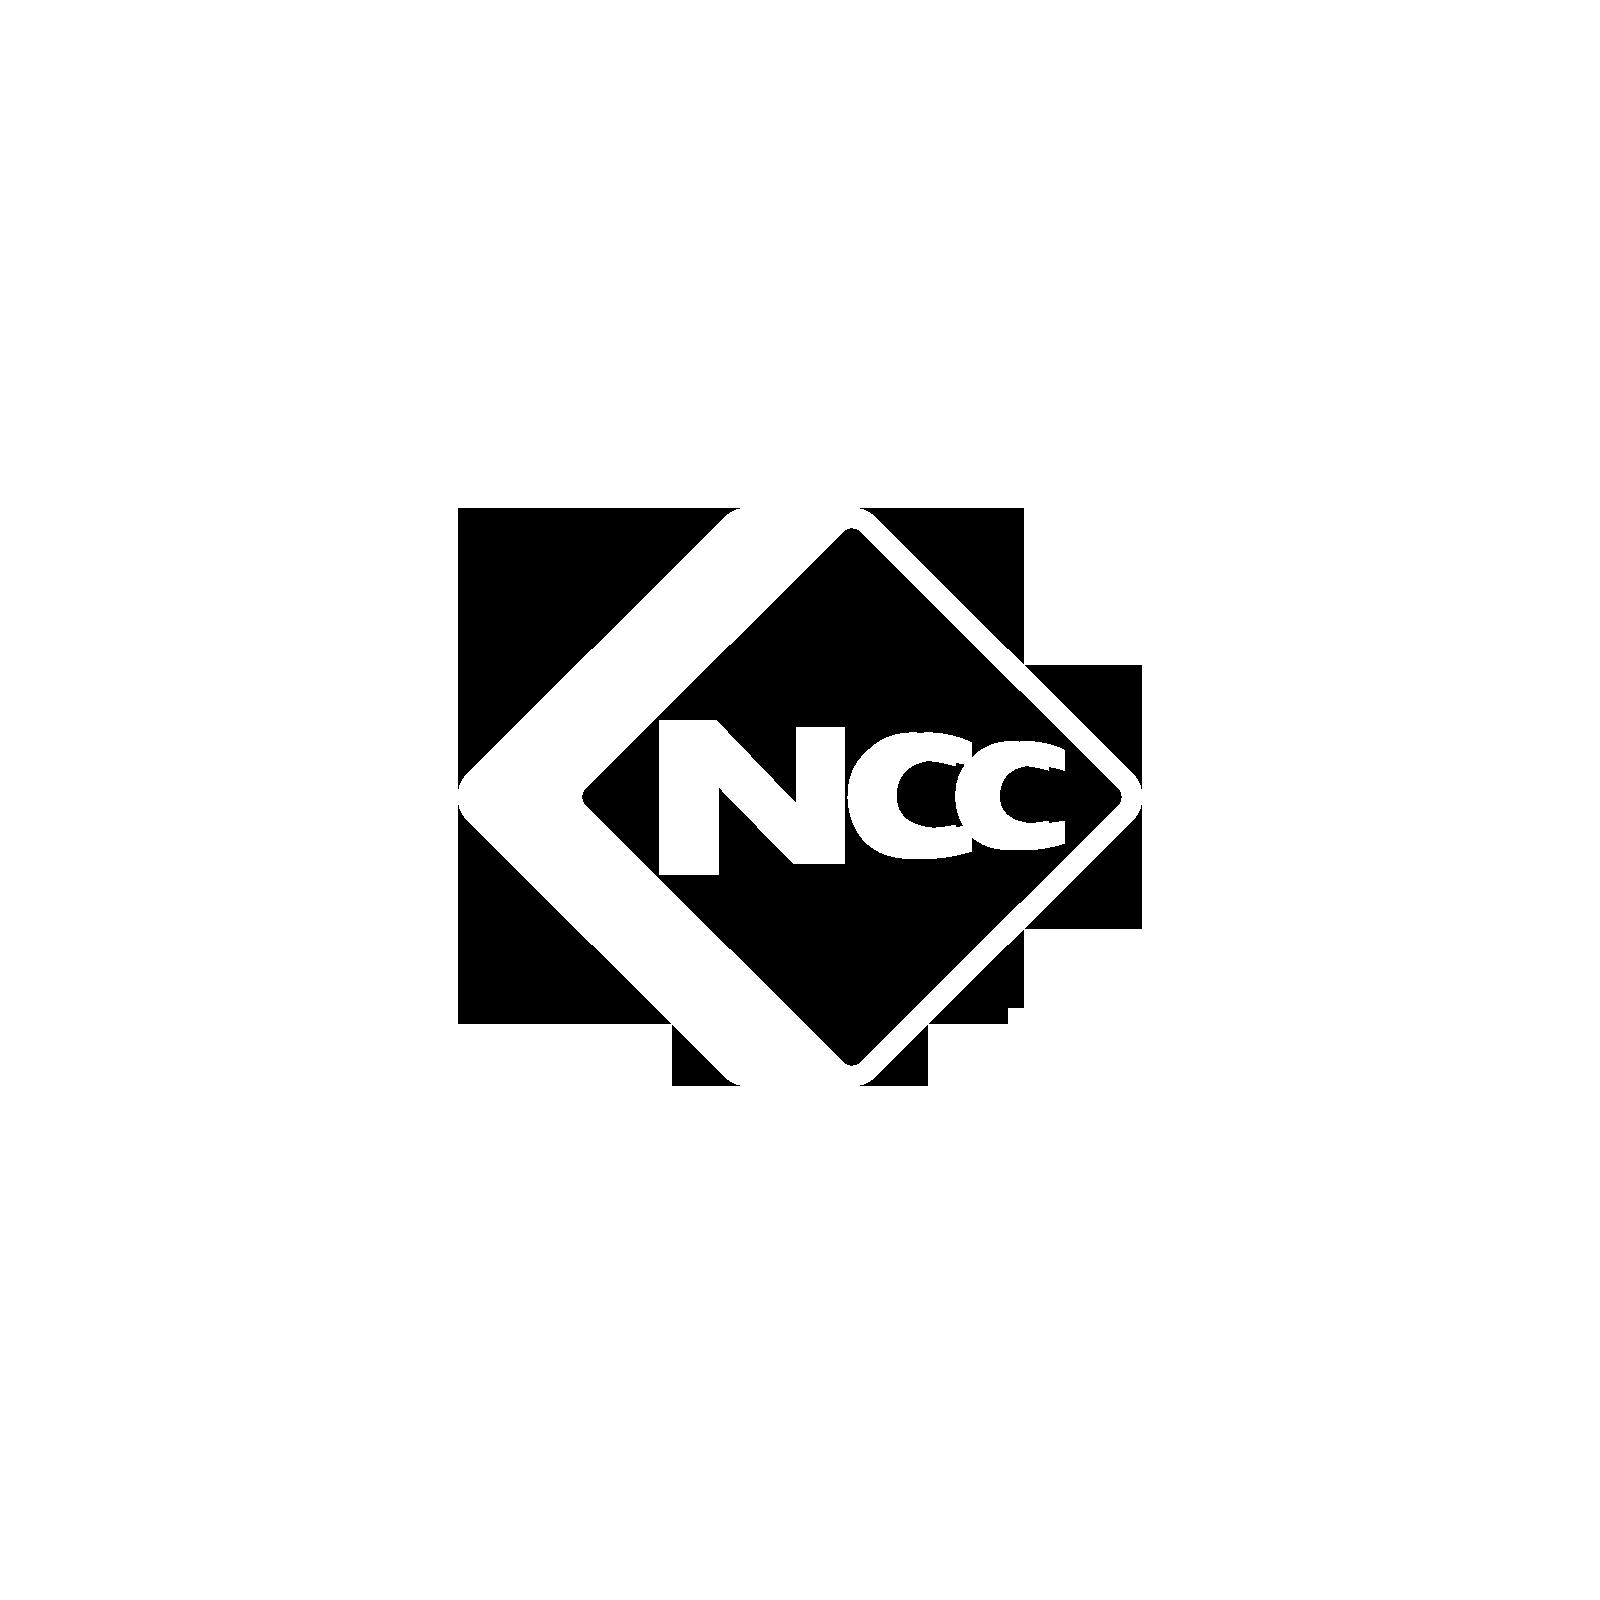 ncc-project-logo